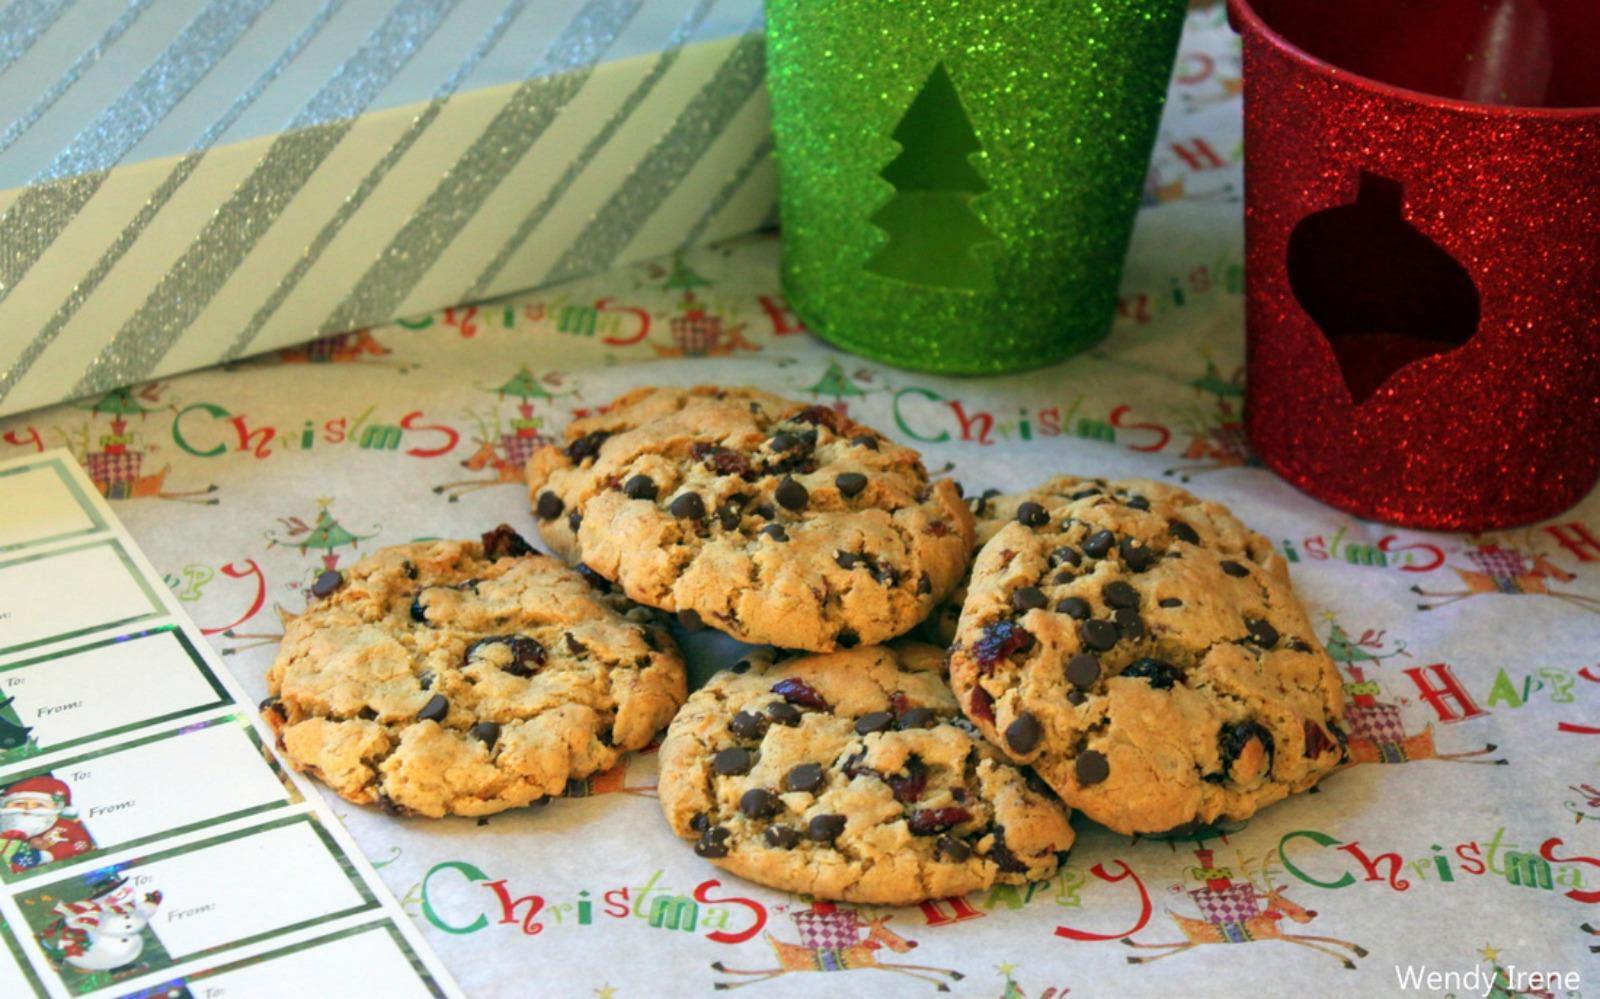 Gluten-Free Oatmeal Cranberry Chocolate Chip Cookies [Vegan]